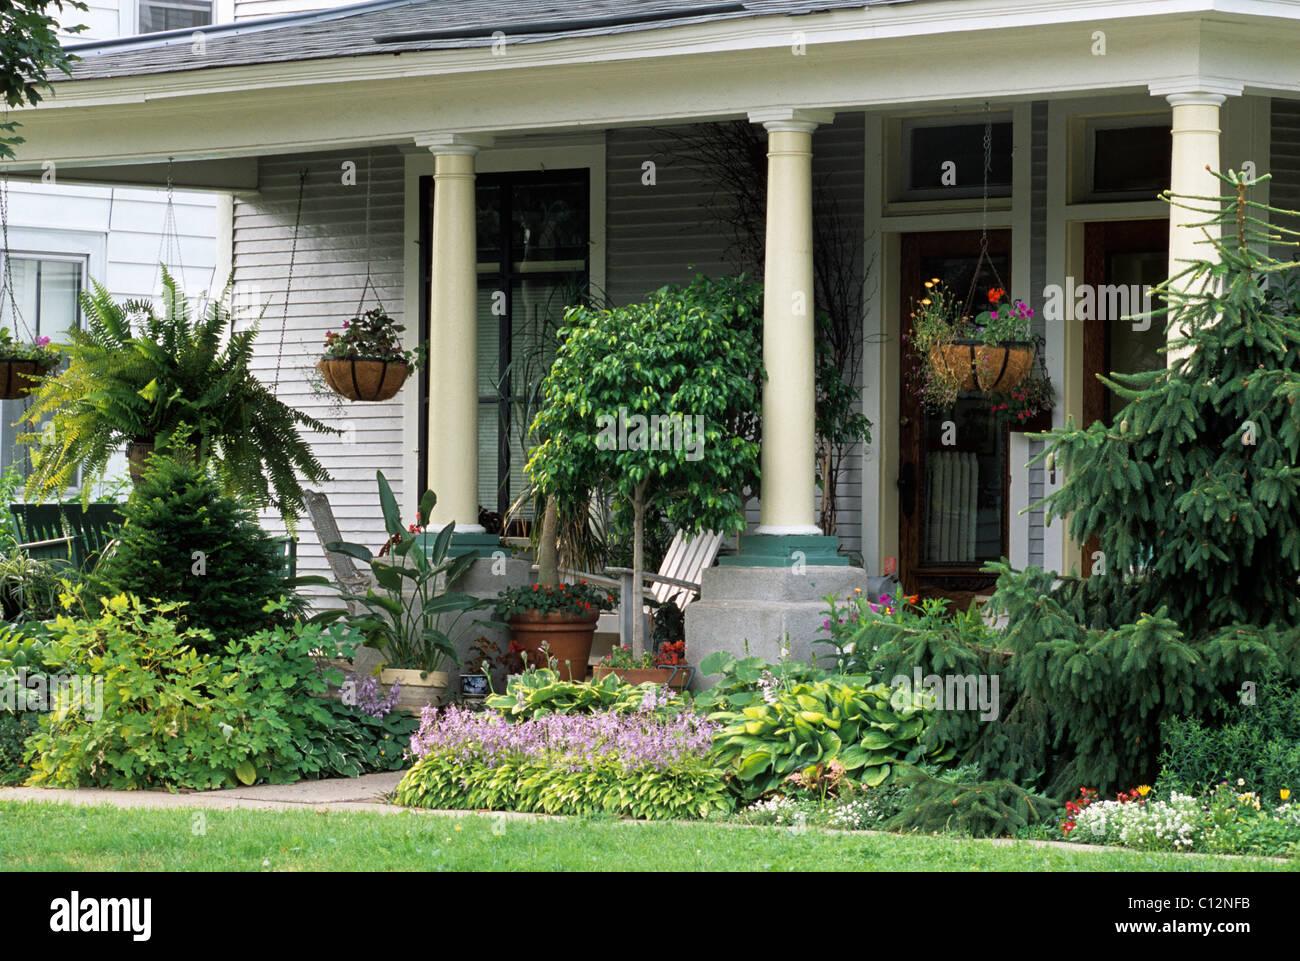 Front Porch Or Veranda Of 19th Century American Home